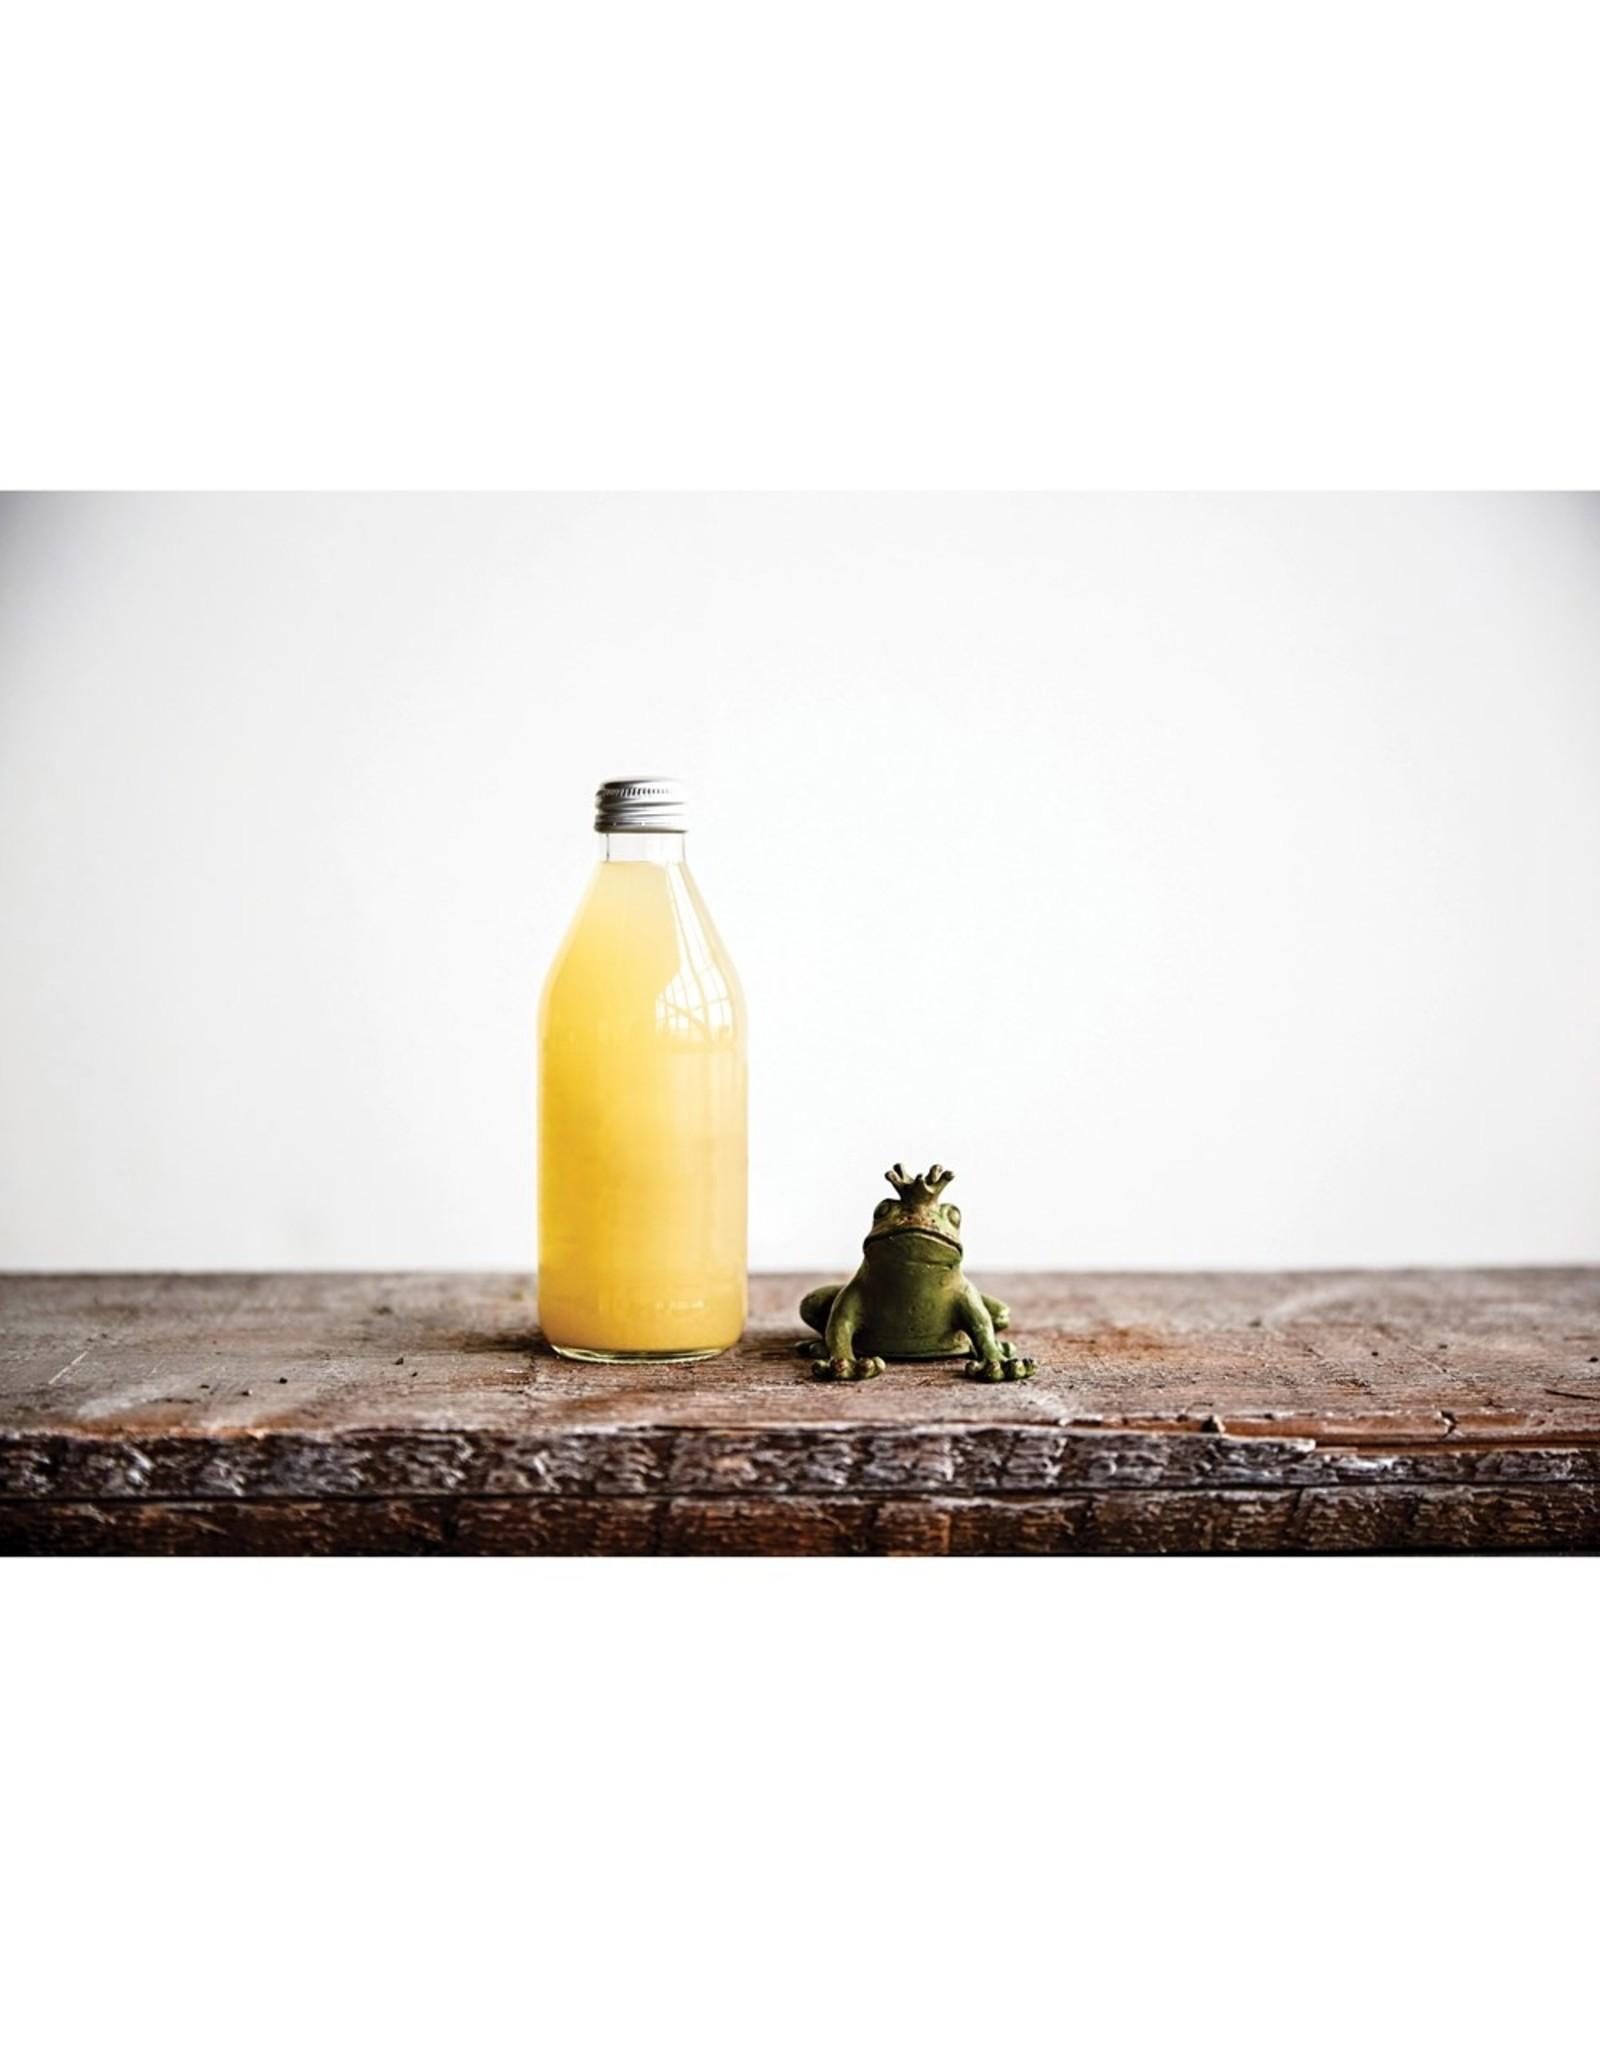 Pewter Frog Bottle Opener